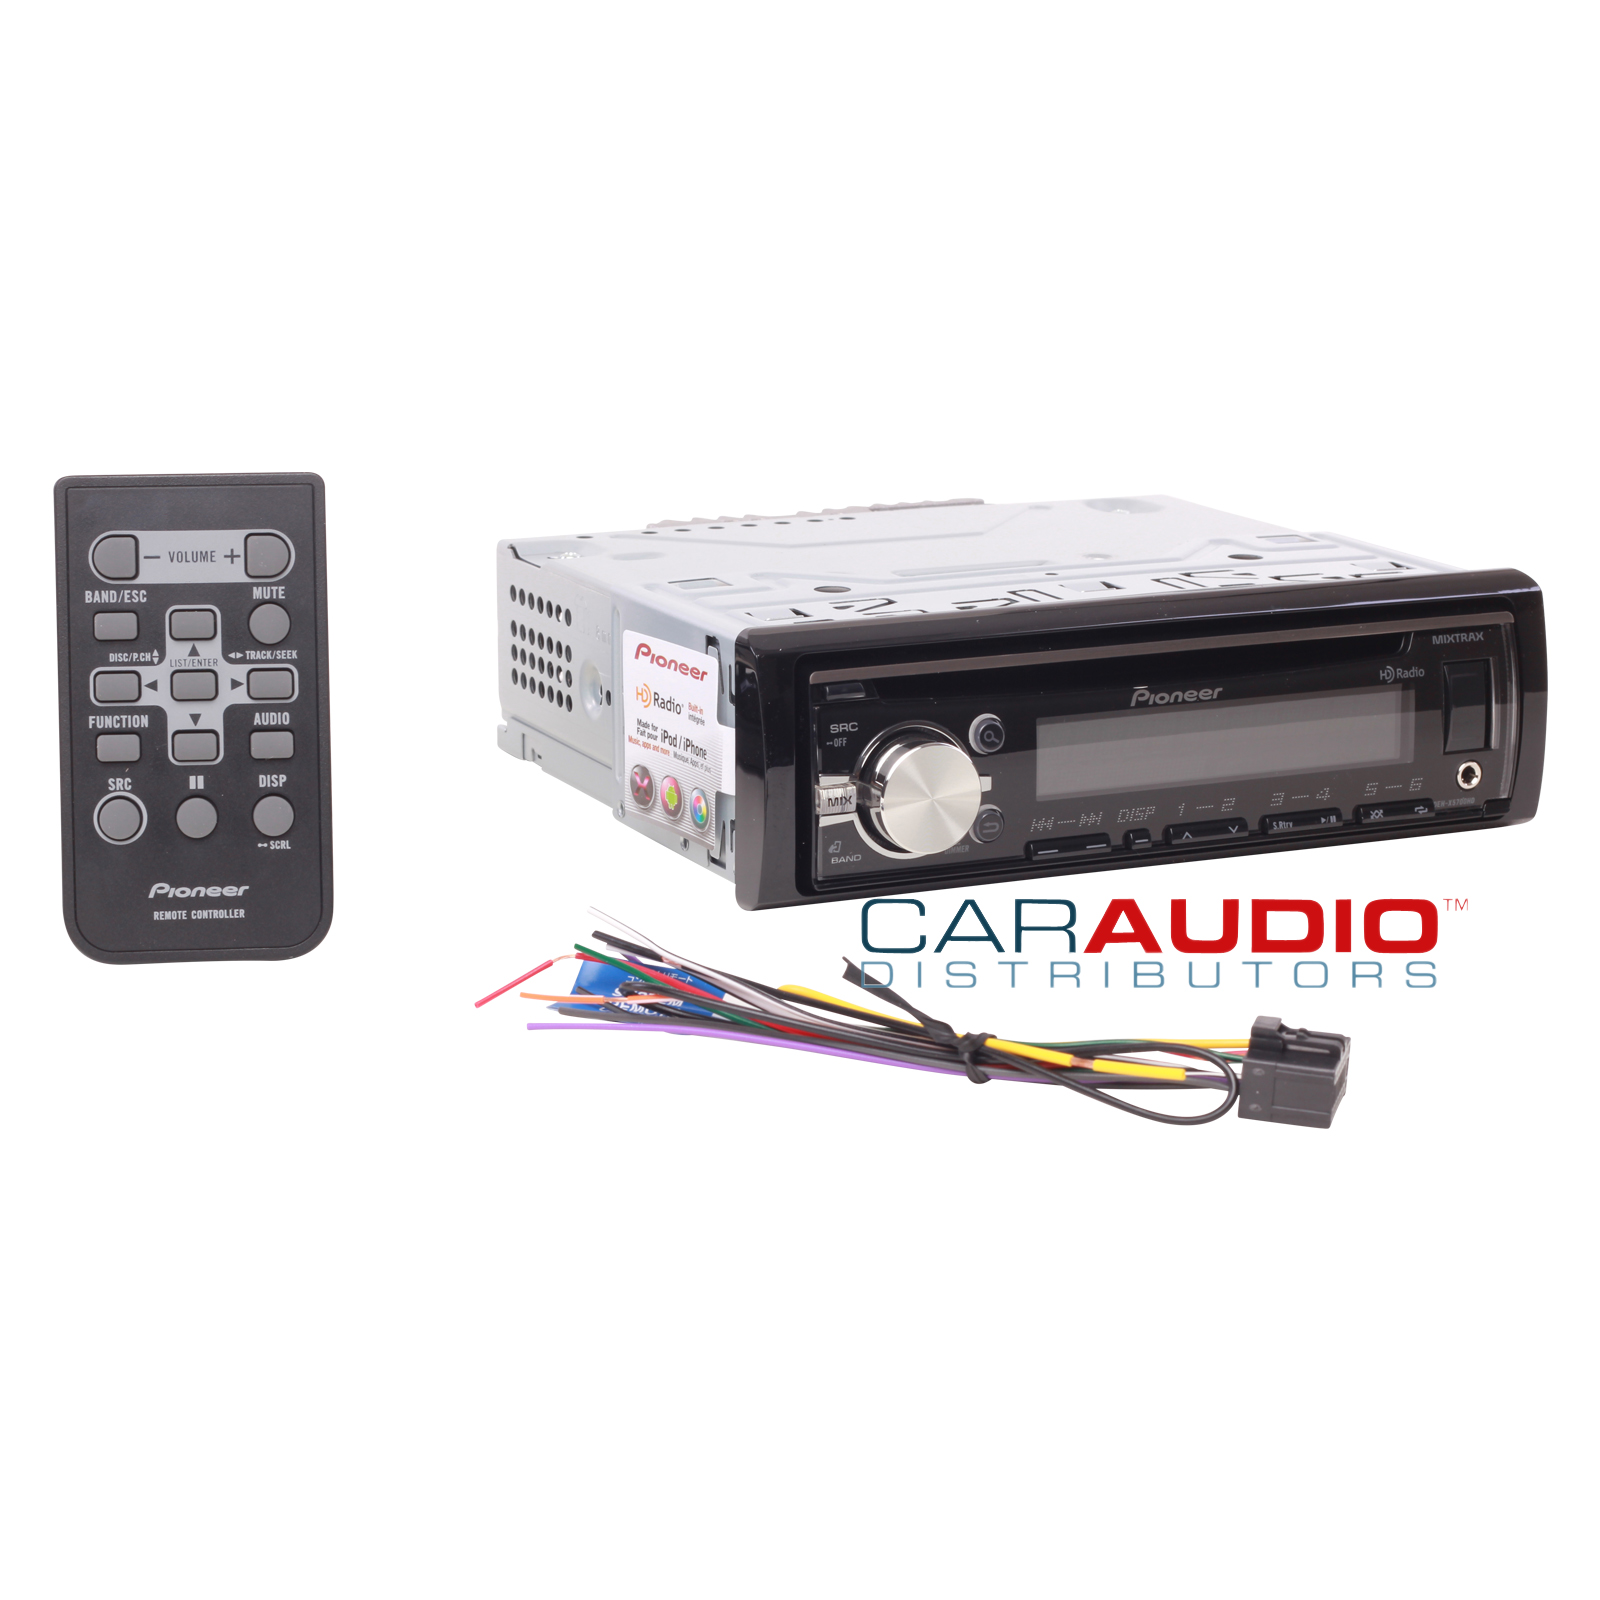 new pioneer deh x5700hd single din in dash car stereo am fm cd mp3 ipod pandora ebay